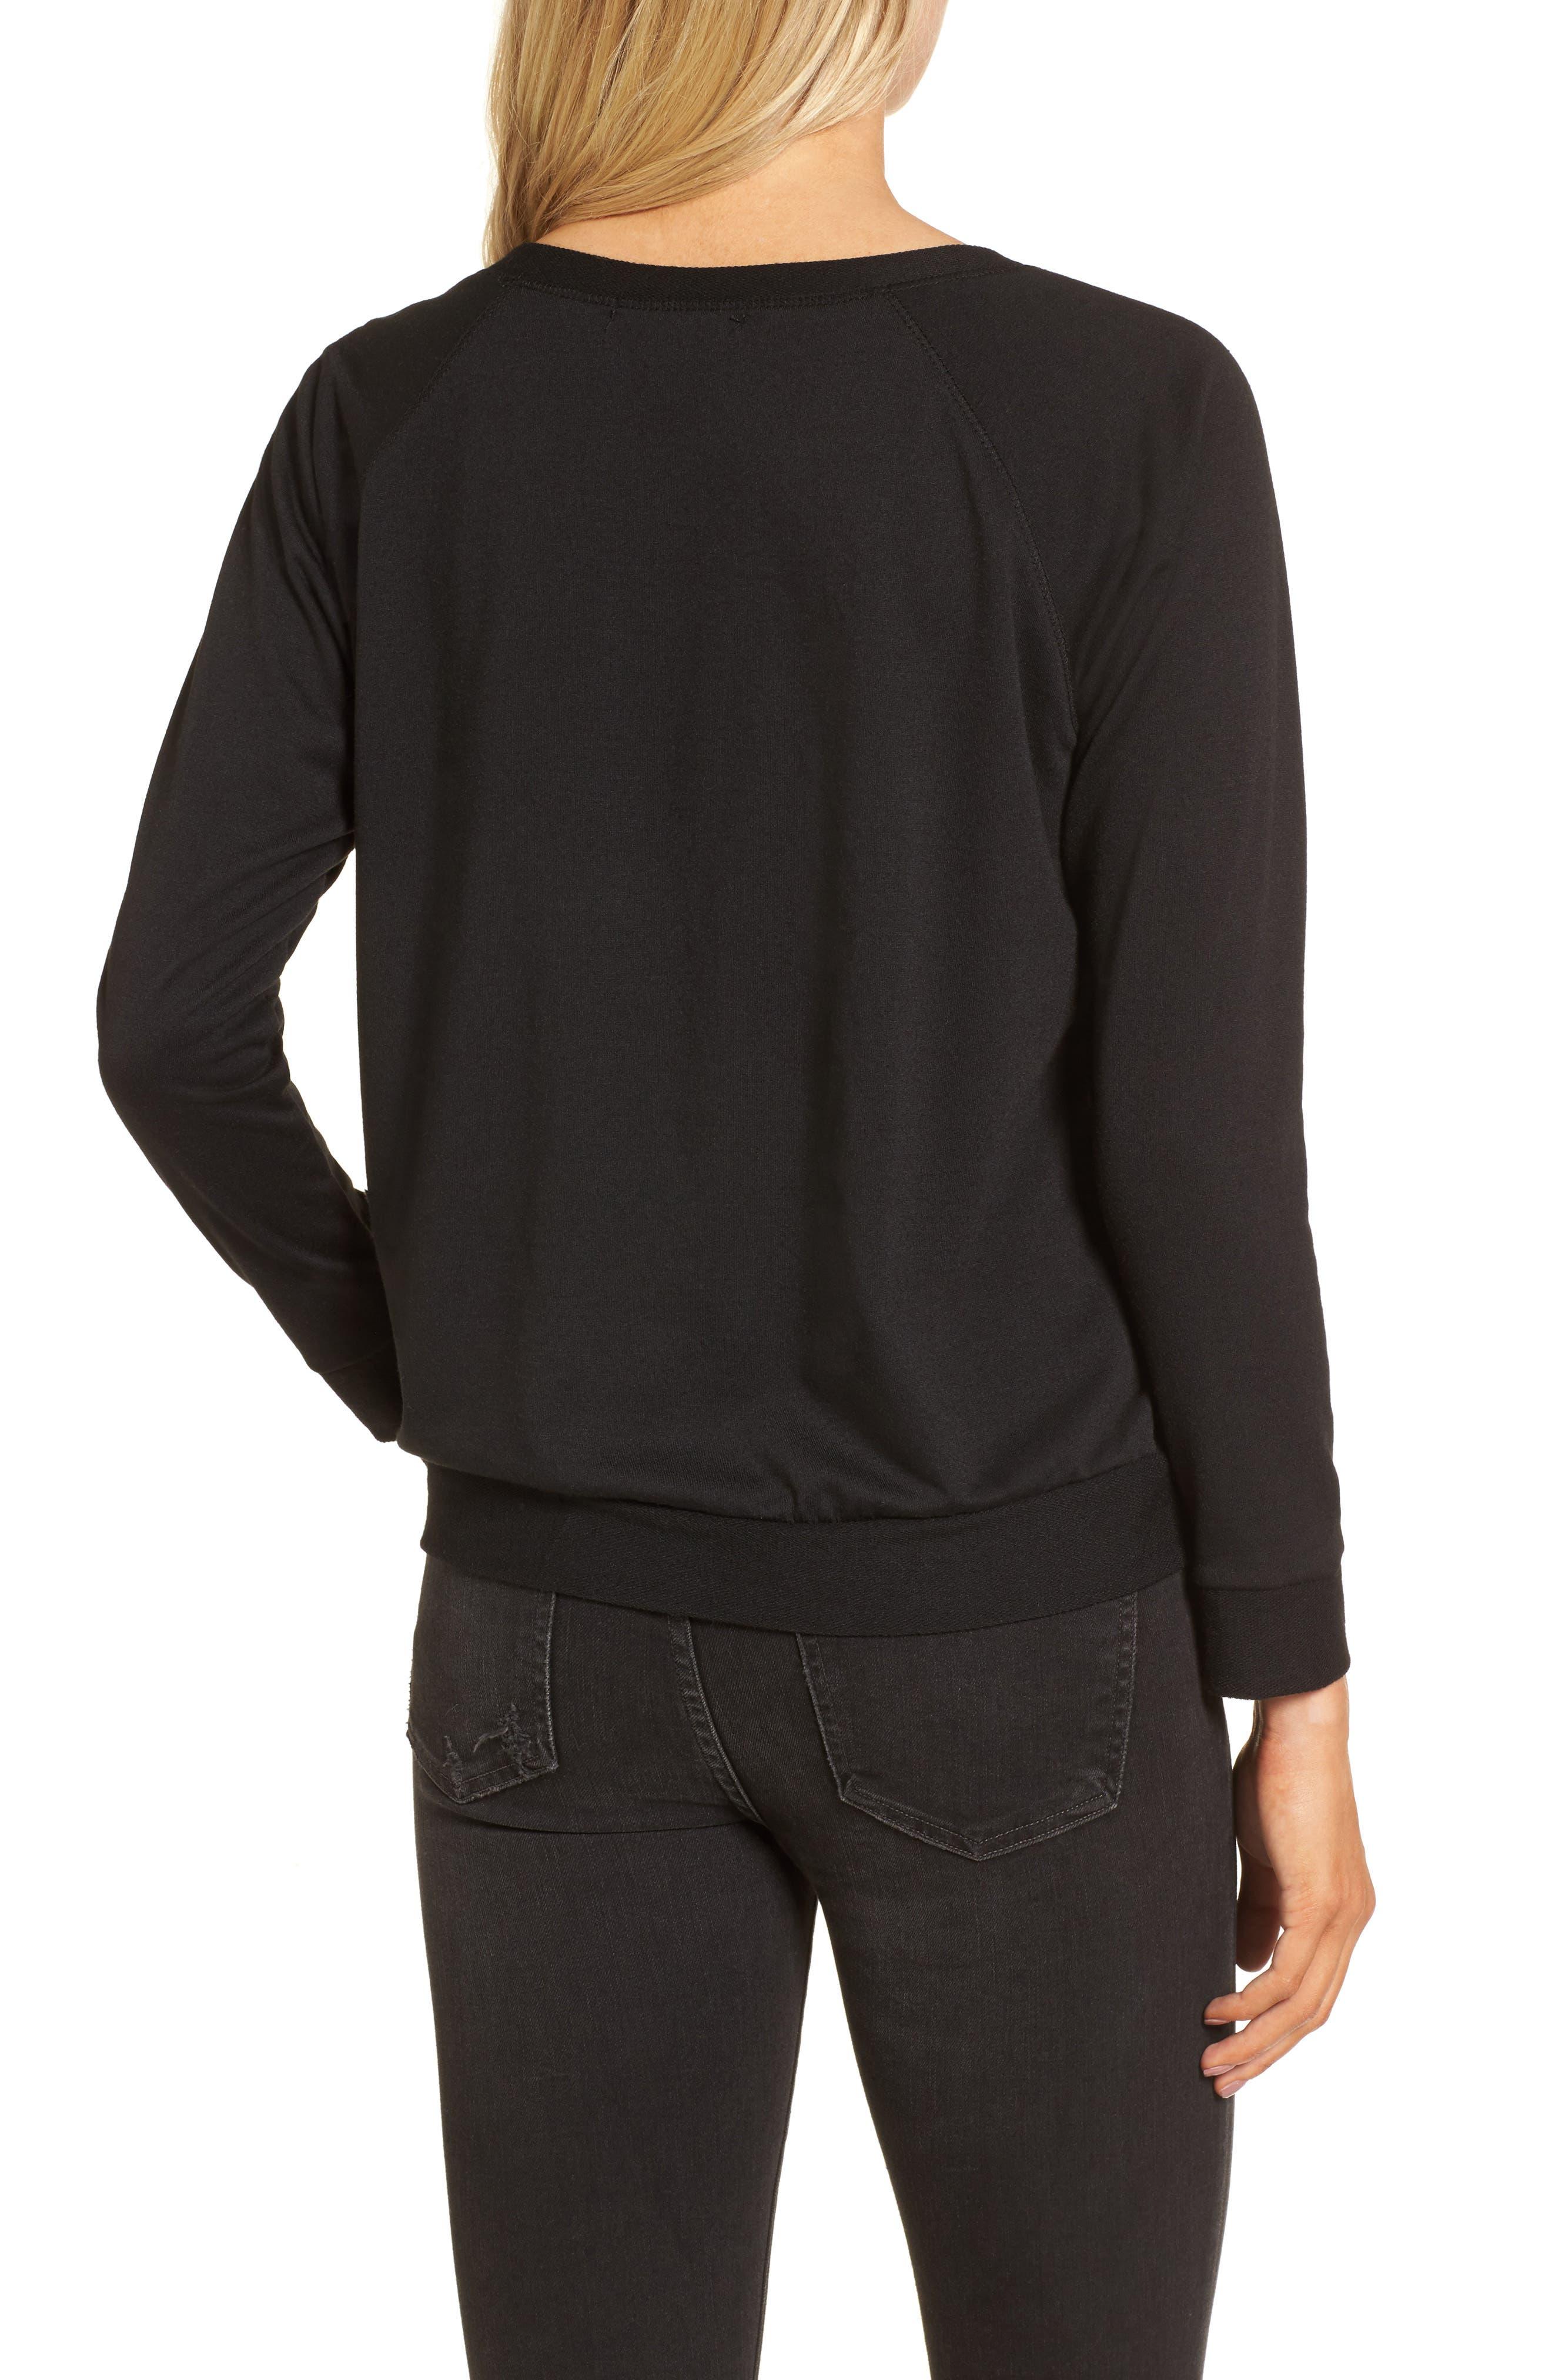 Winter Is Coming Sweatshirt,                             Alternate thumbnail 2, color,                             Black